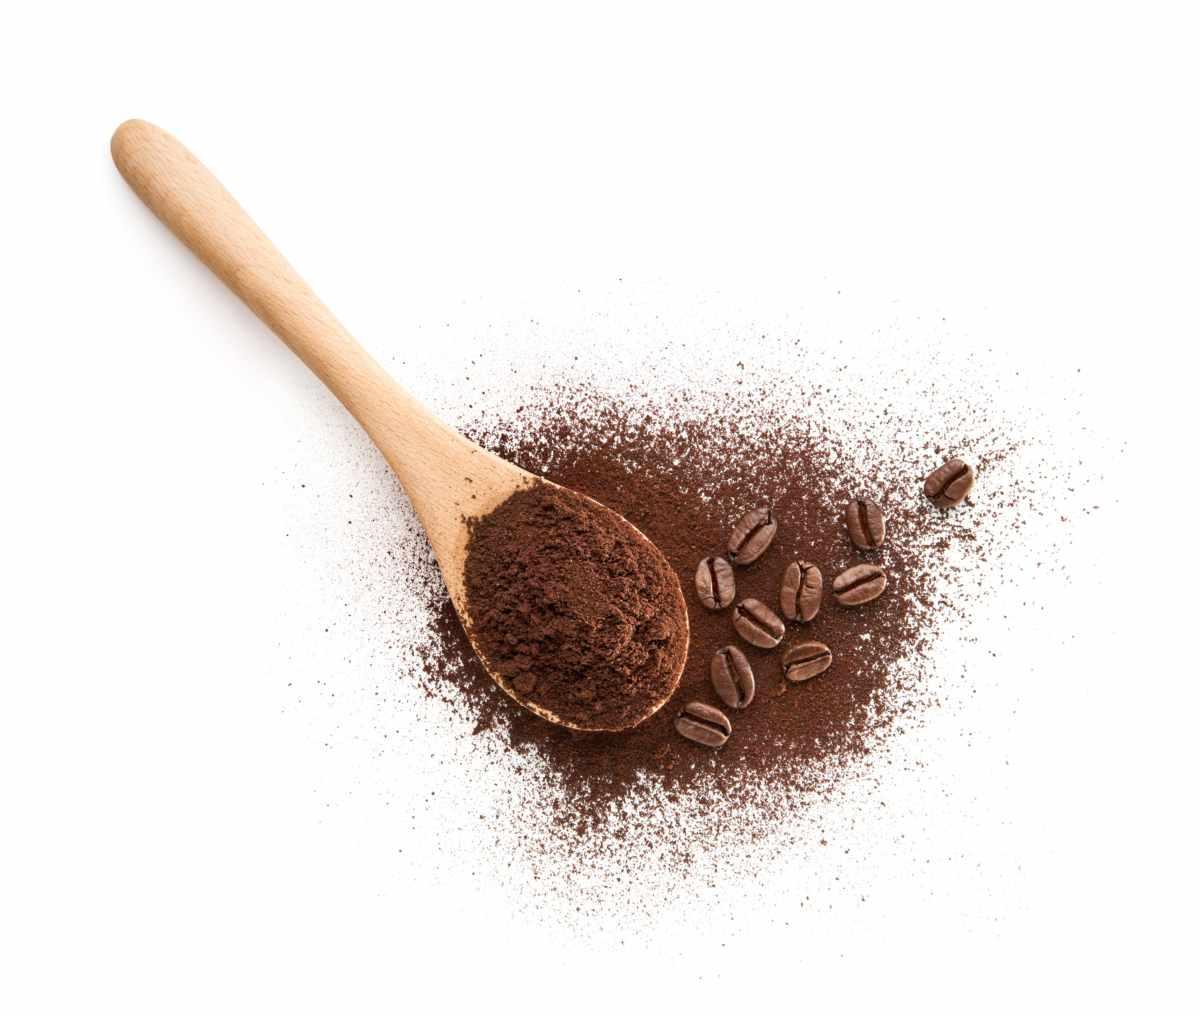 Crema pasticcera al caffè FOTO ricettasprint